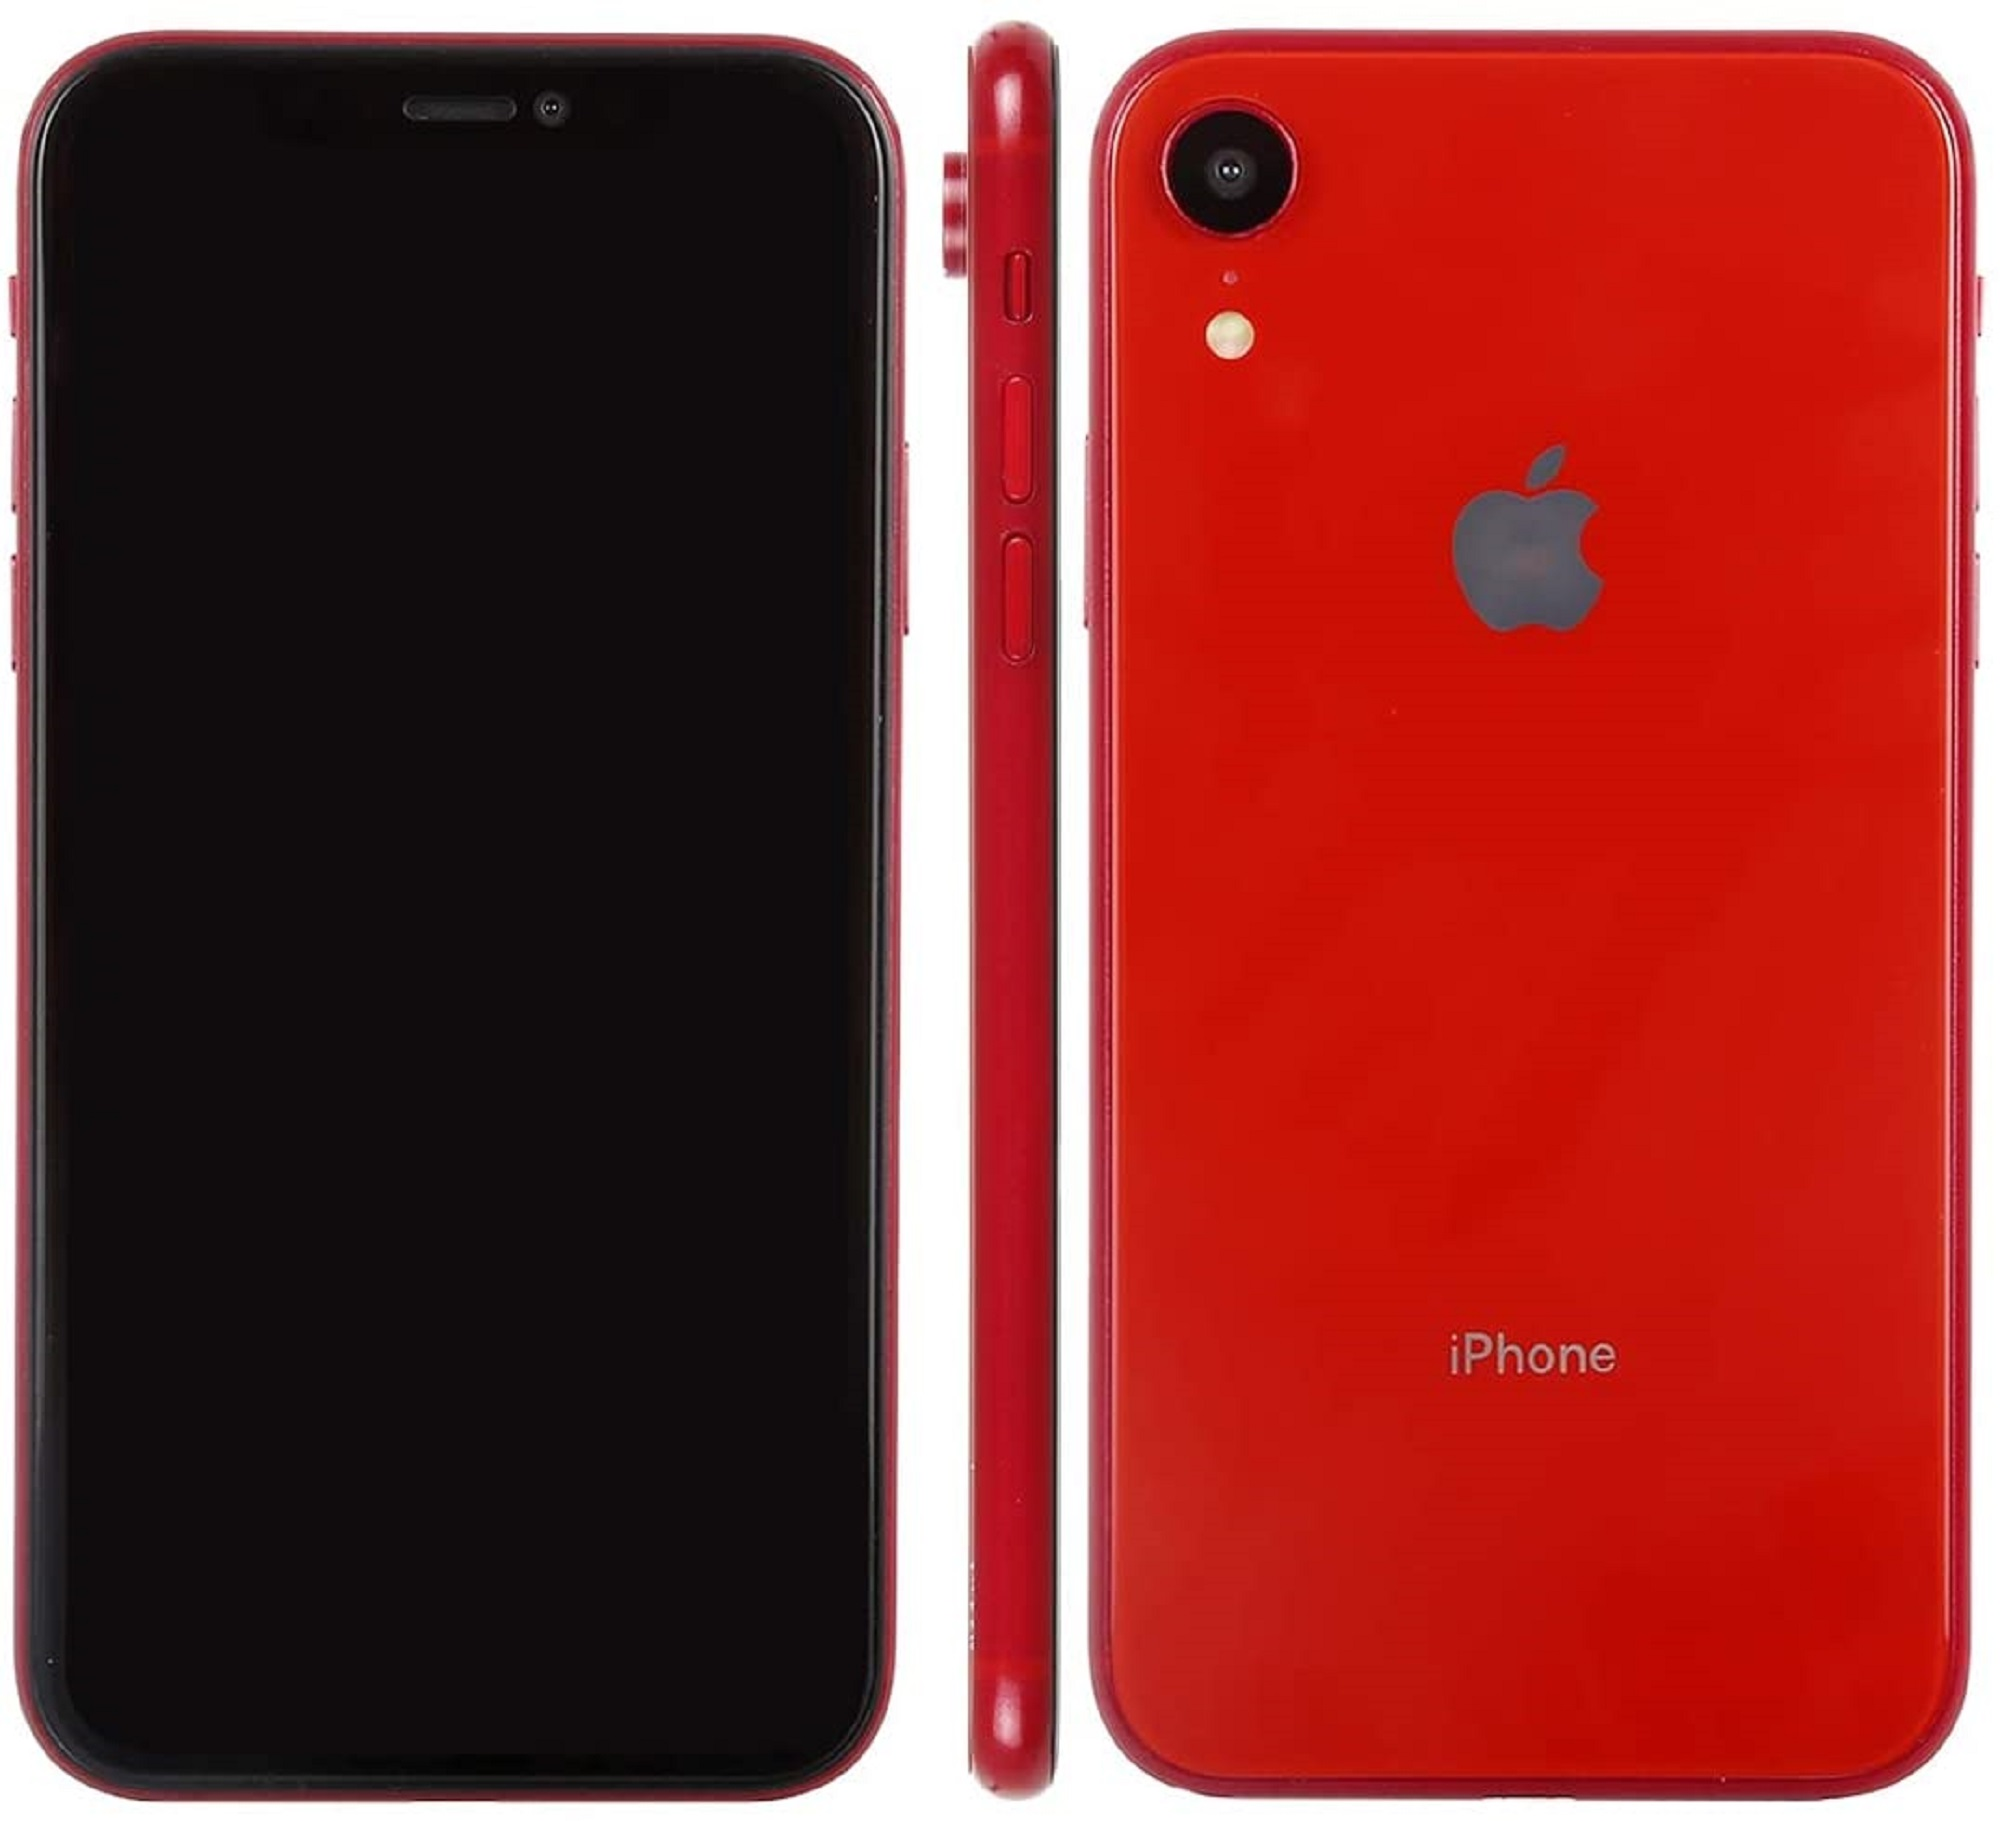 thumbnail 17 - Apple iPhone XR 64GB Factory Unlocked Smartphone 4G LTE iOS Smartphone - Very